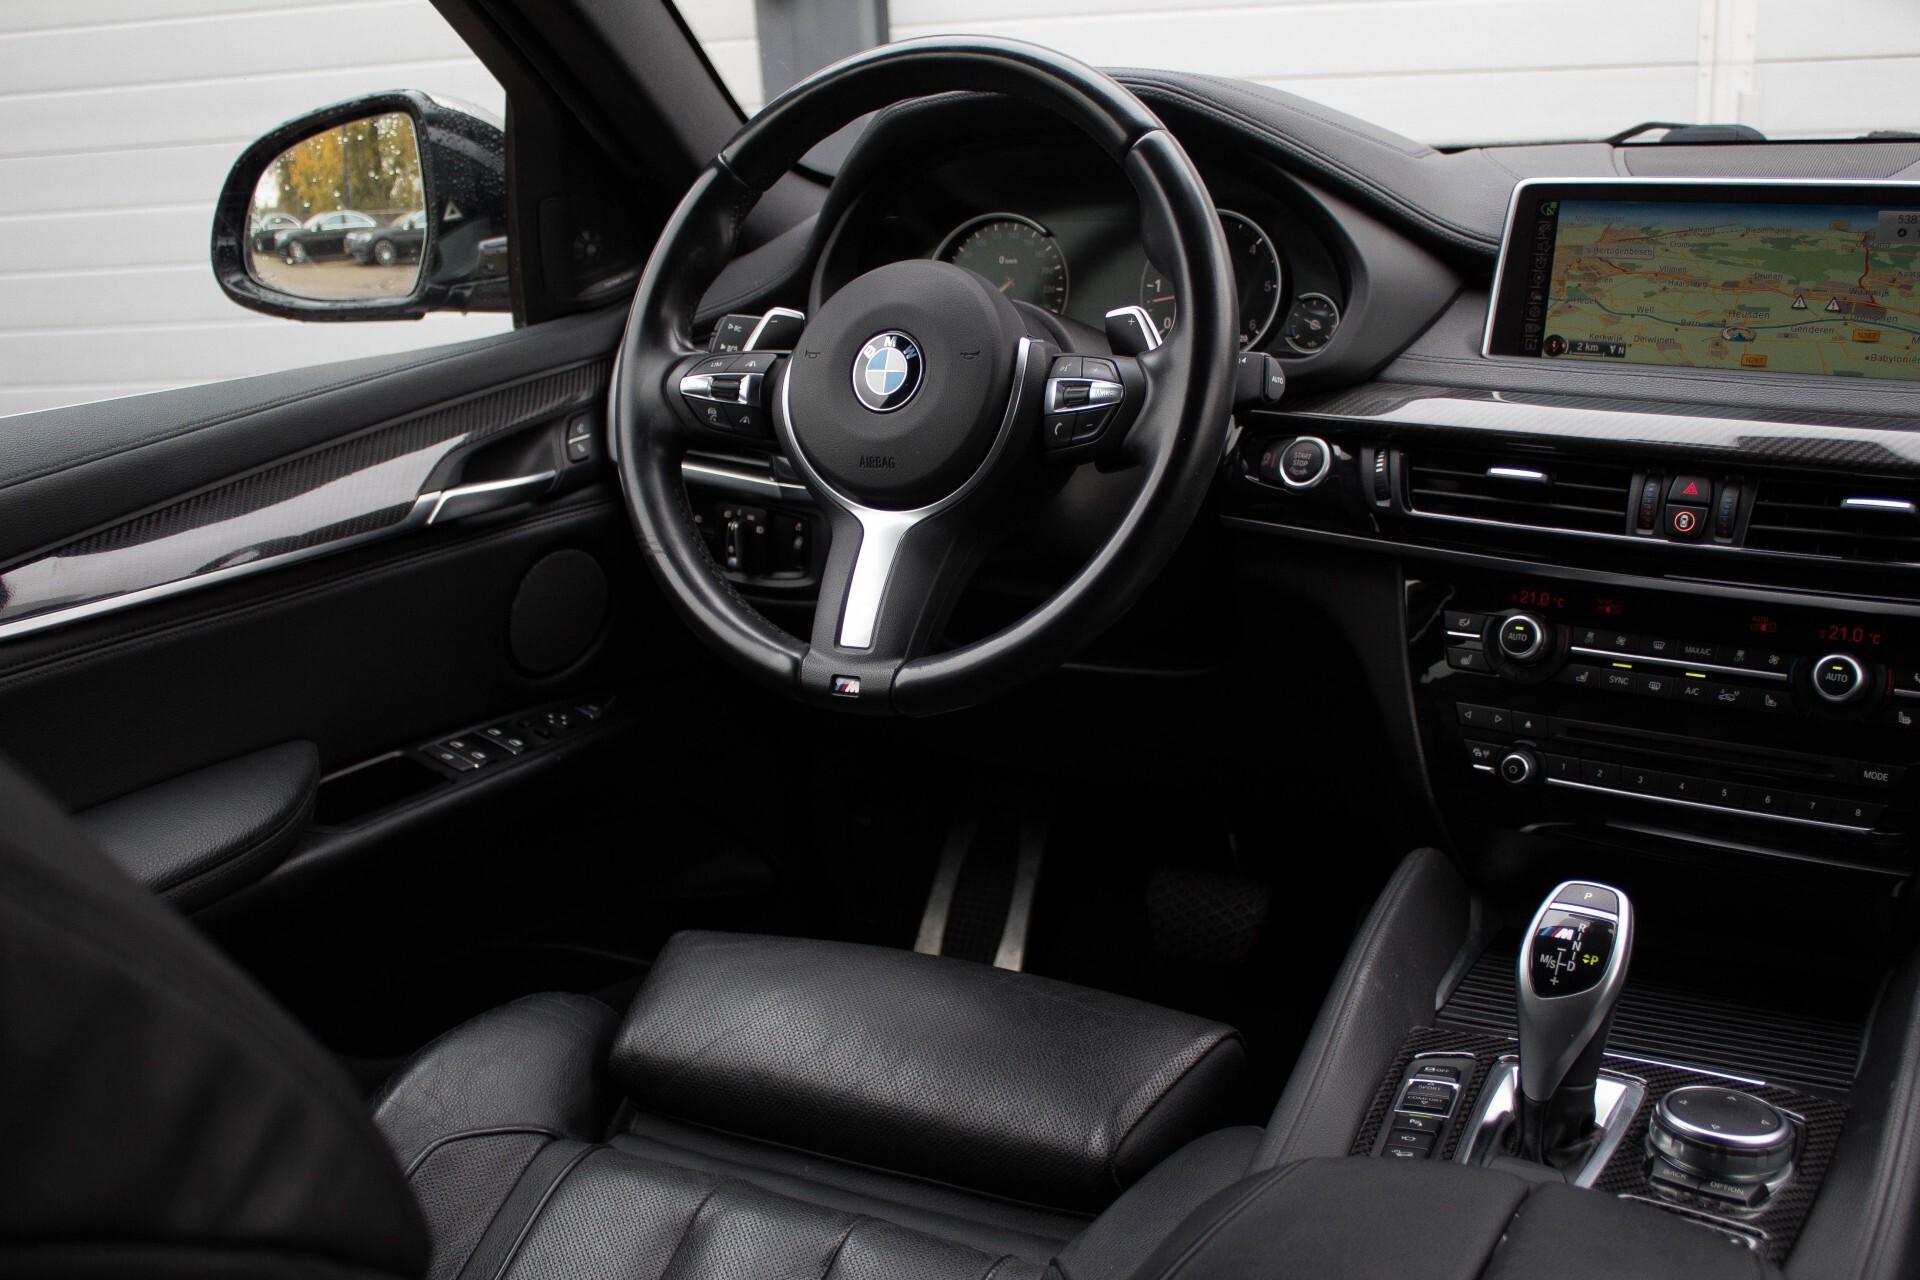 BMW X6 5.0d M Adaptive Drive/Comfortacces/Softclose/Adaptive Cruise/Standkachel/360camera/HUD/DAB Aut8 Foto 7